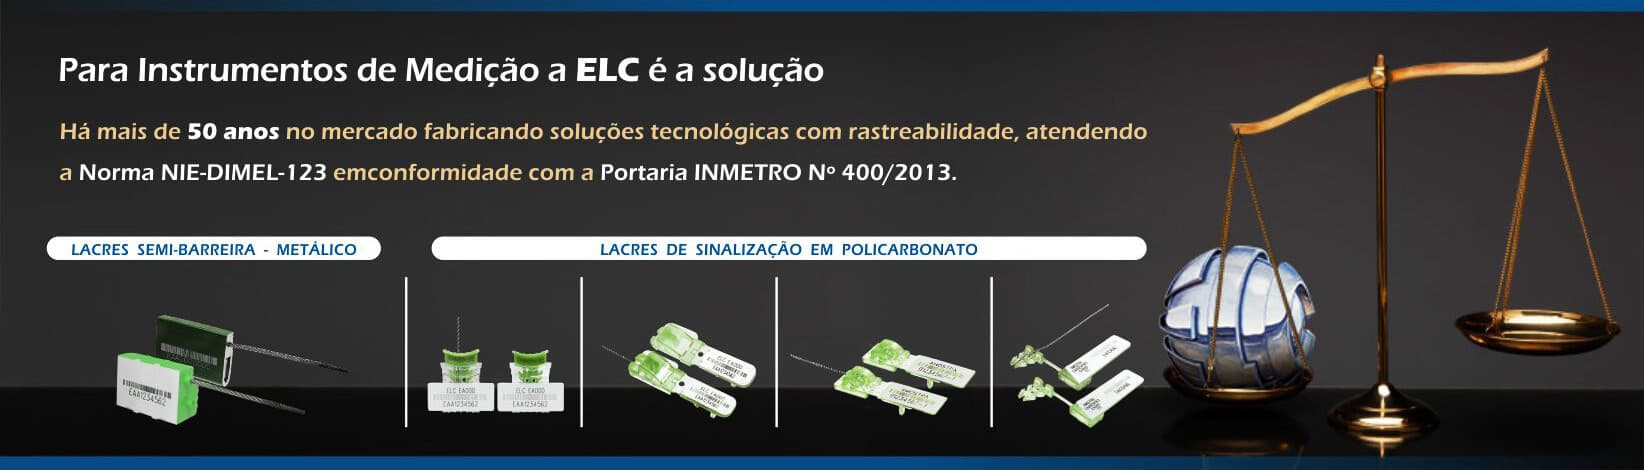 banner-home-elc-11